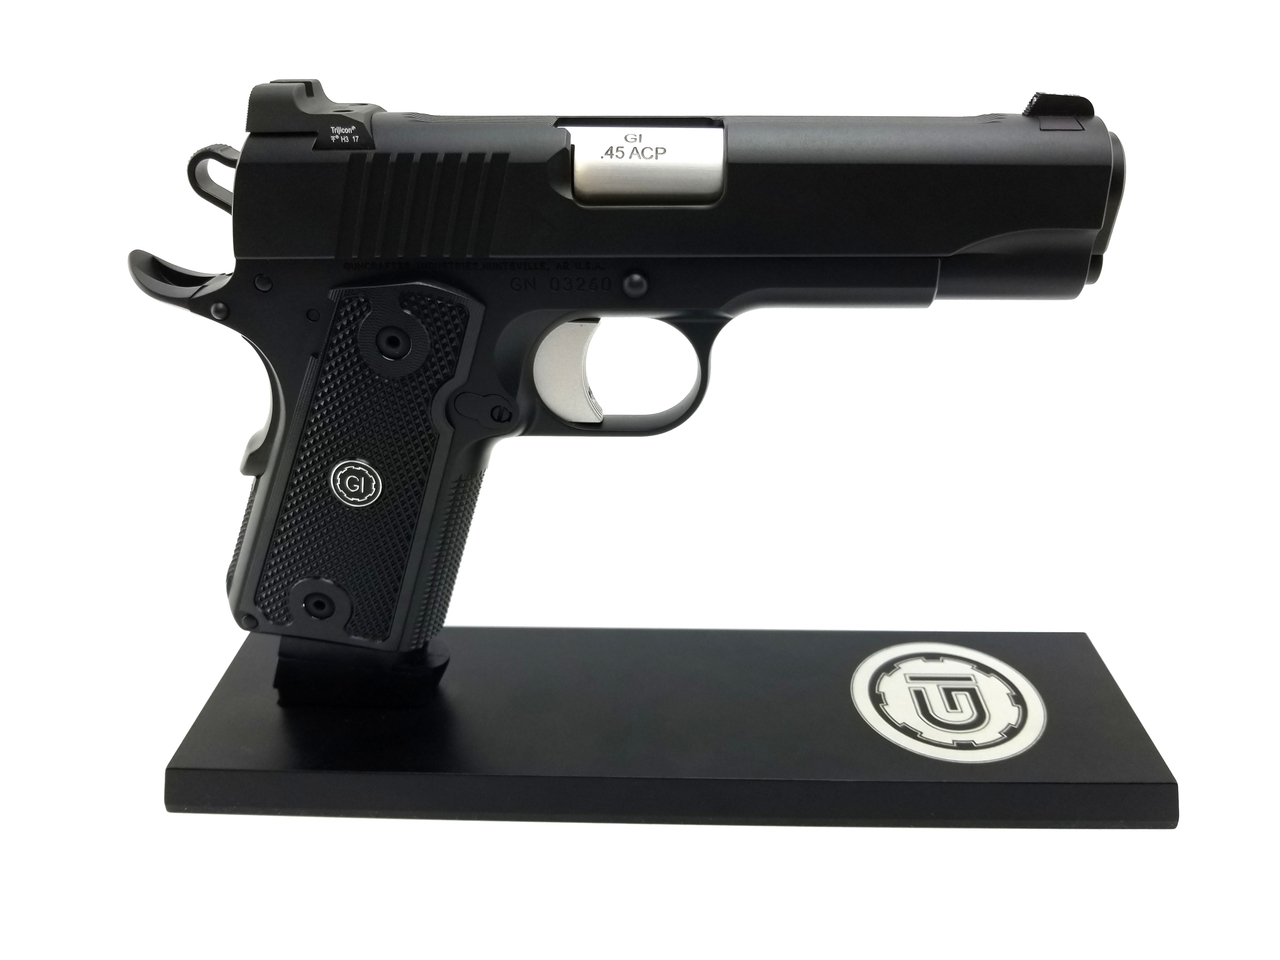 Guncrafter Industries NO NAME CCO pistol